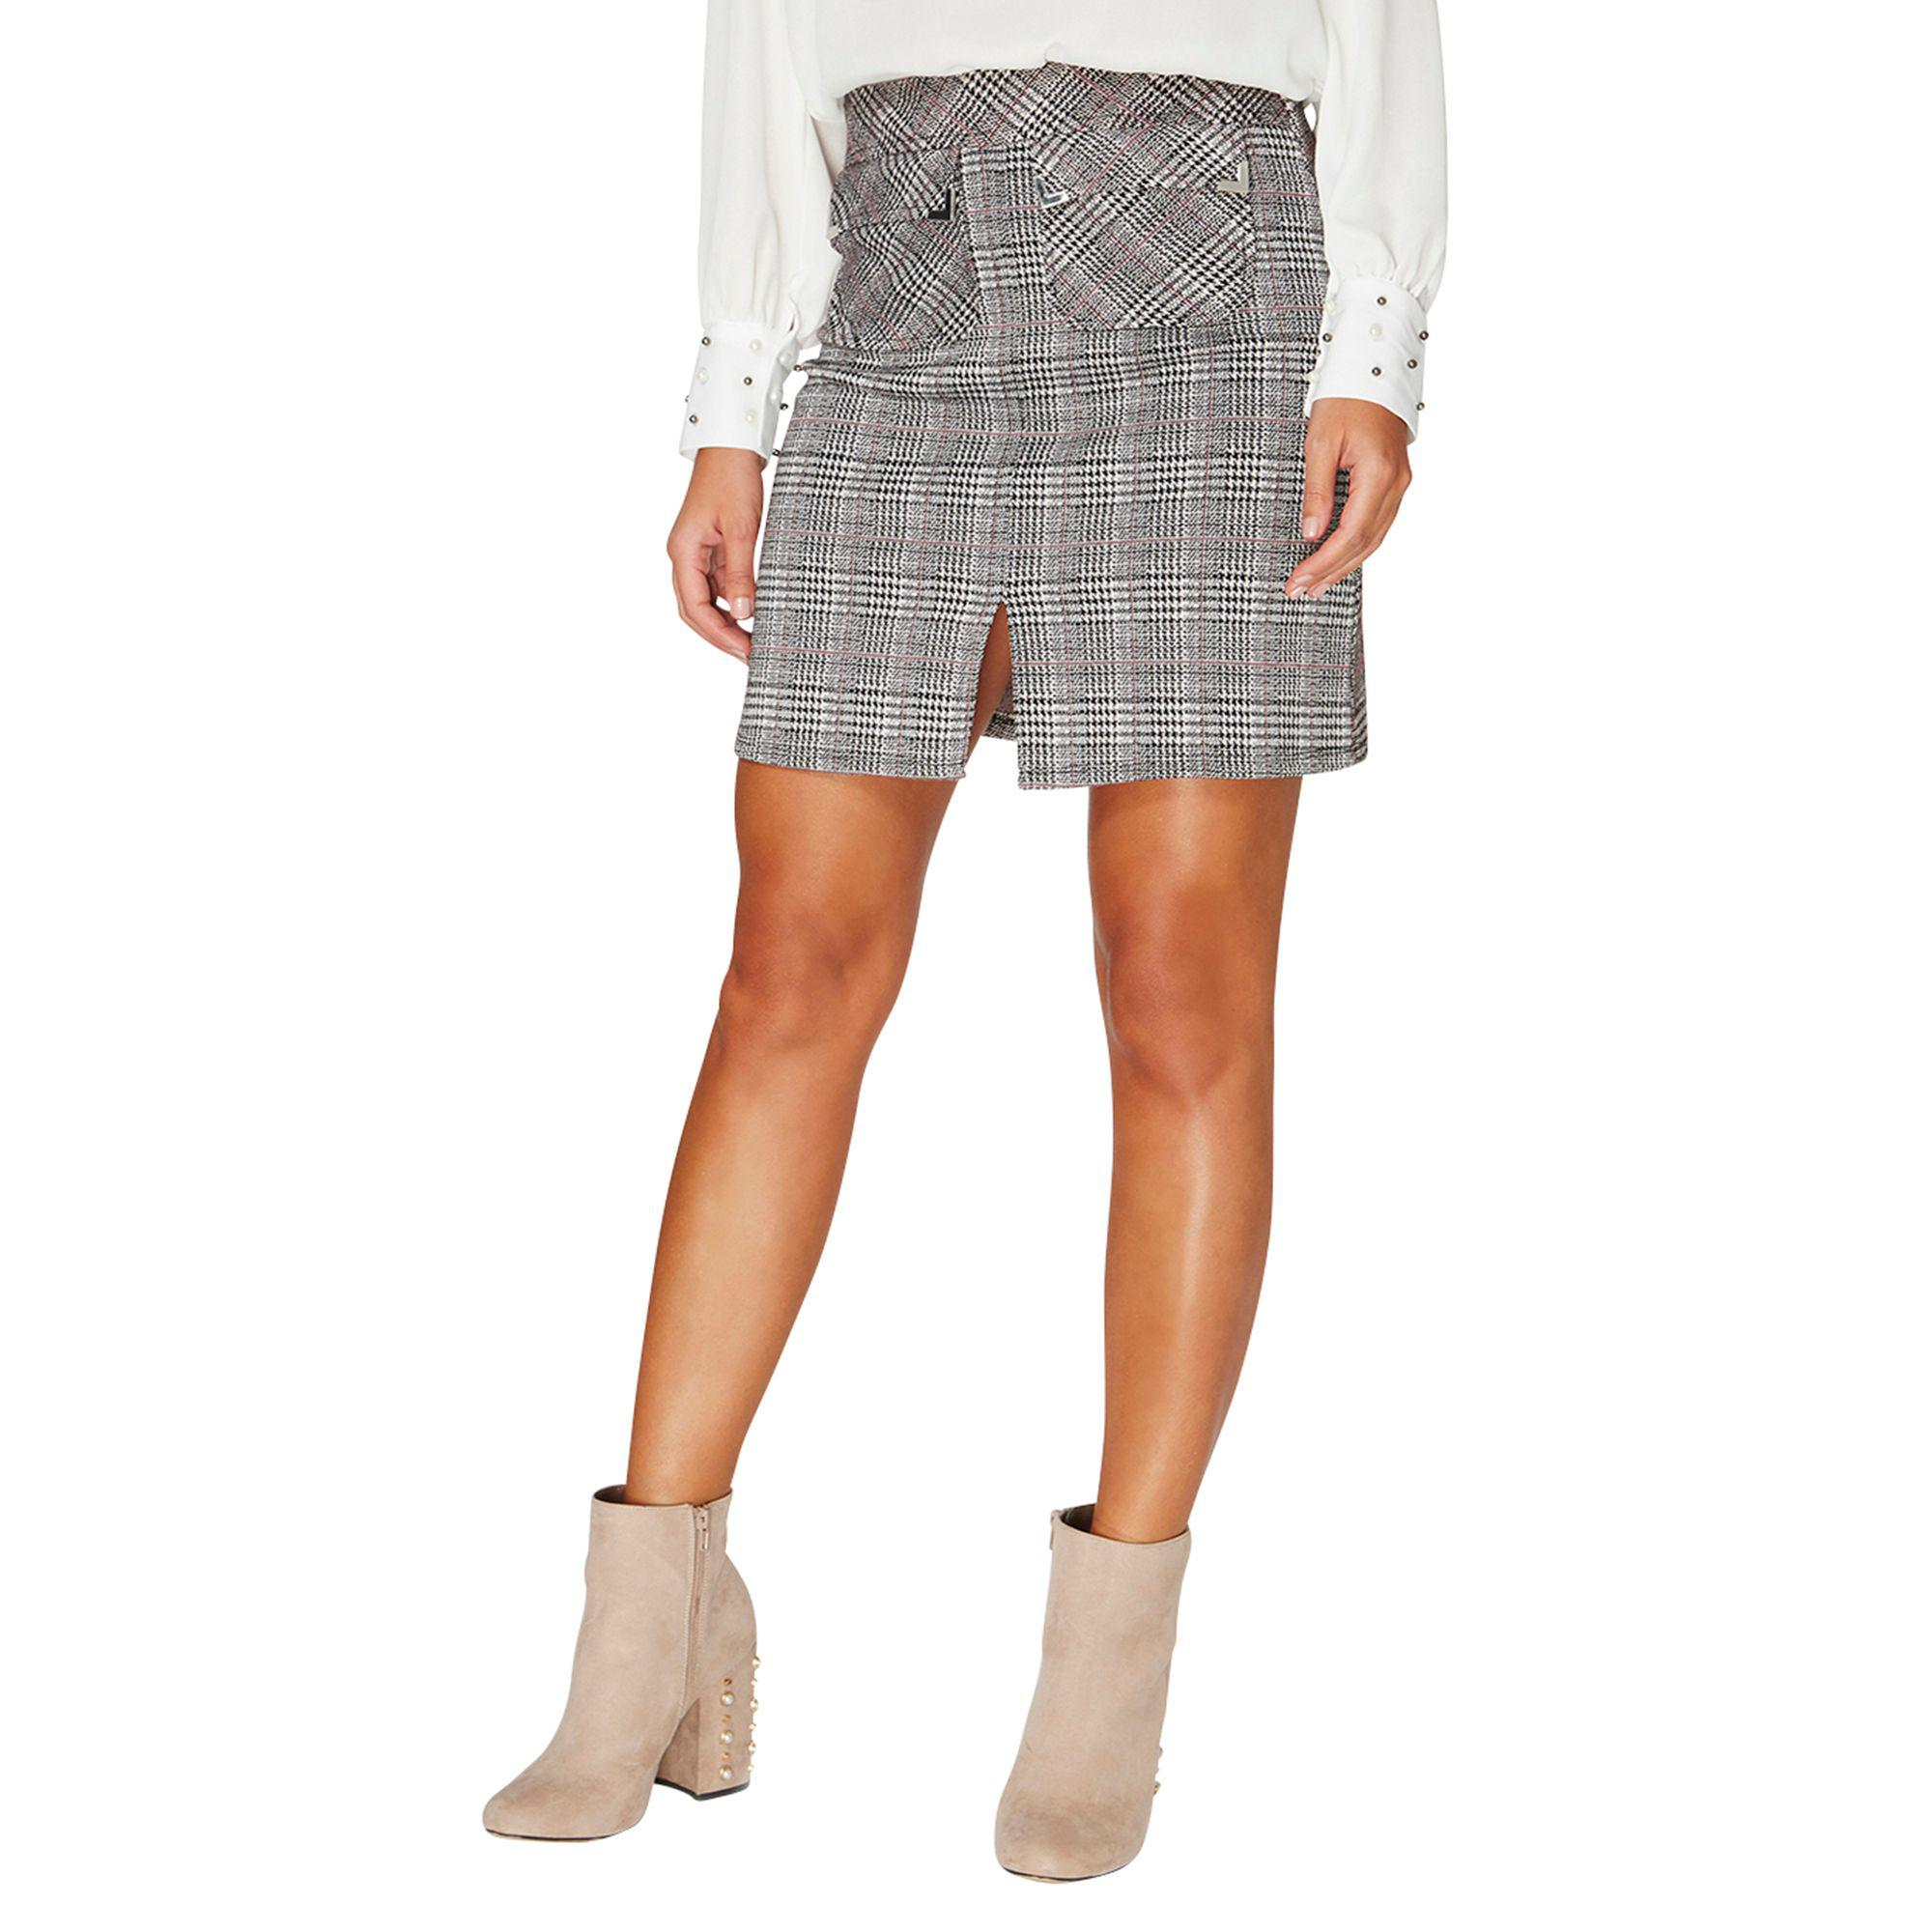 Dorothy Perkins Womens Multi Coloured Check Jacquard Mini Skirt- Cut-Price aFBK0vF